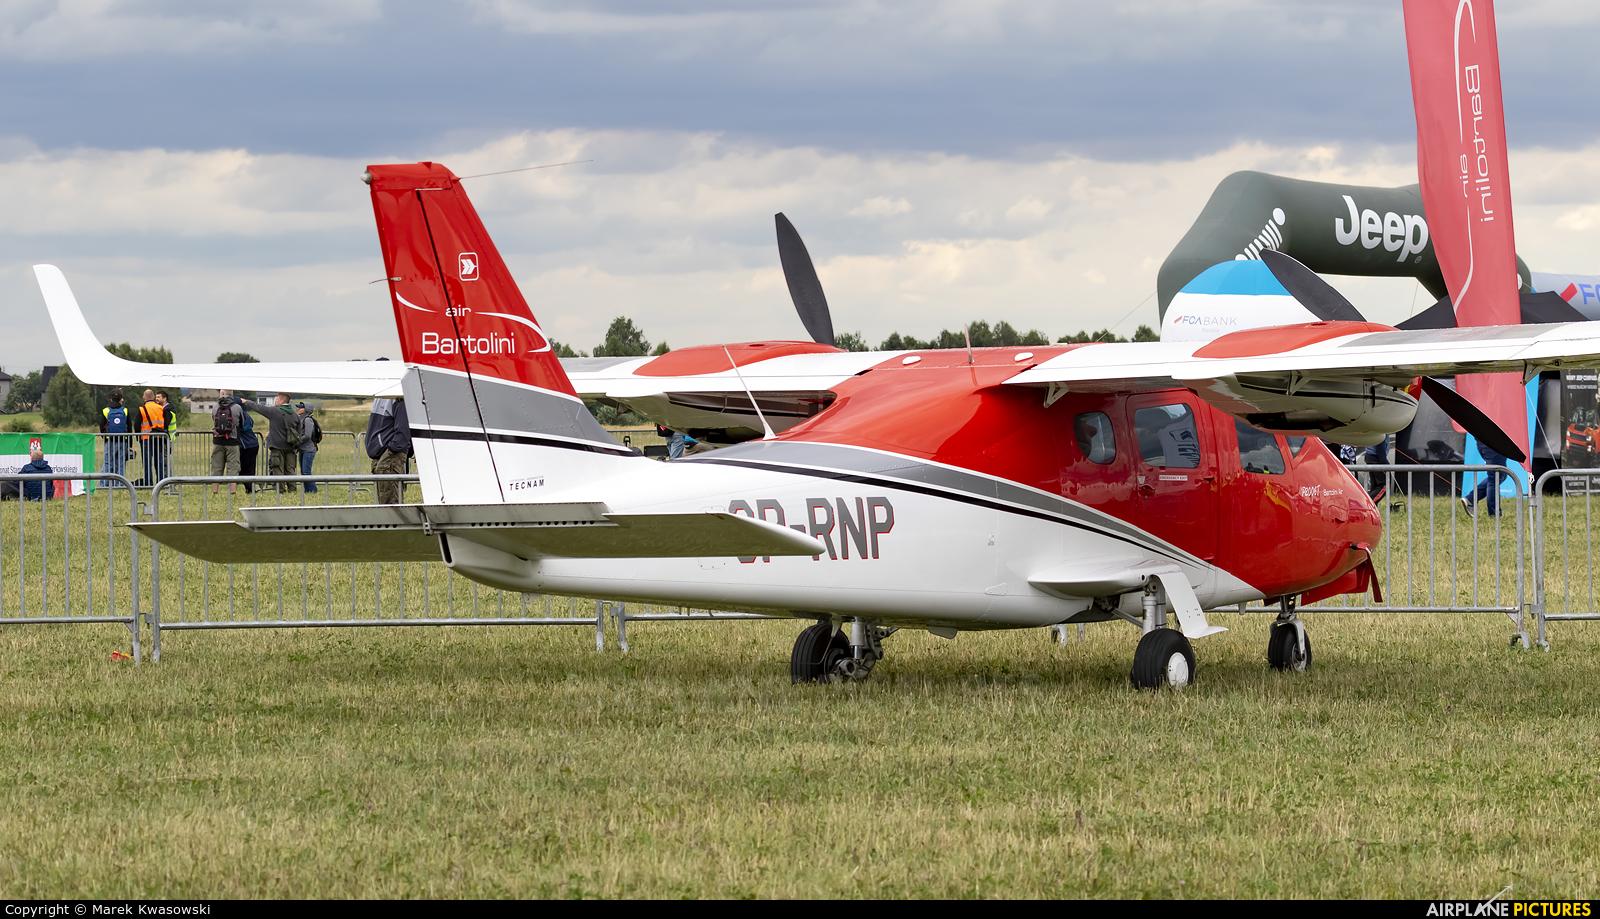 Bartolini Air SP-RNP aircraft at Piotrków Trybunalski